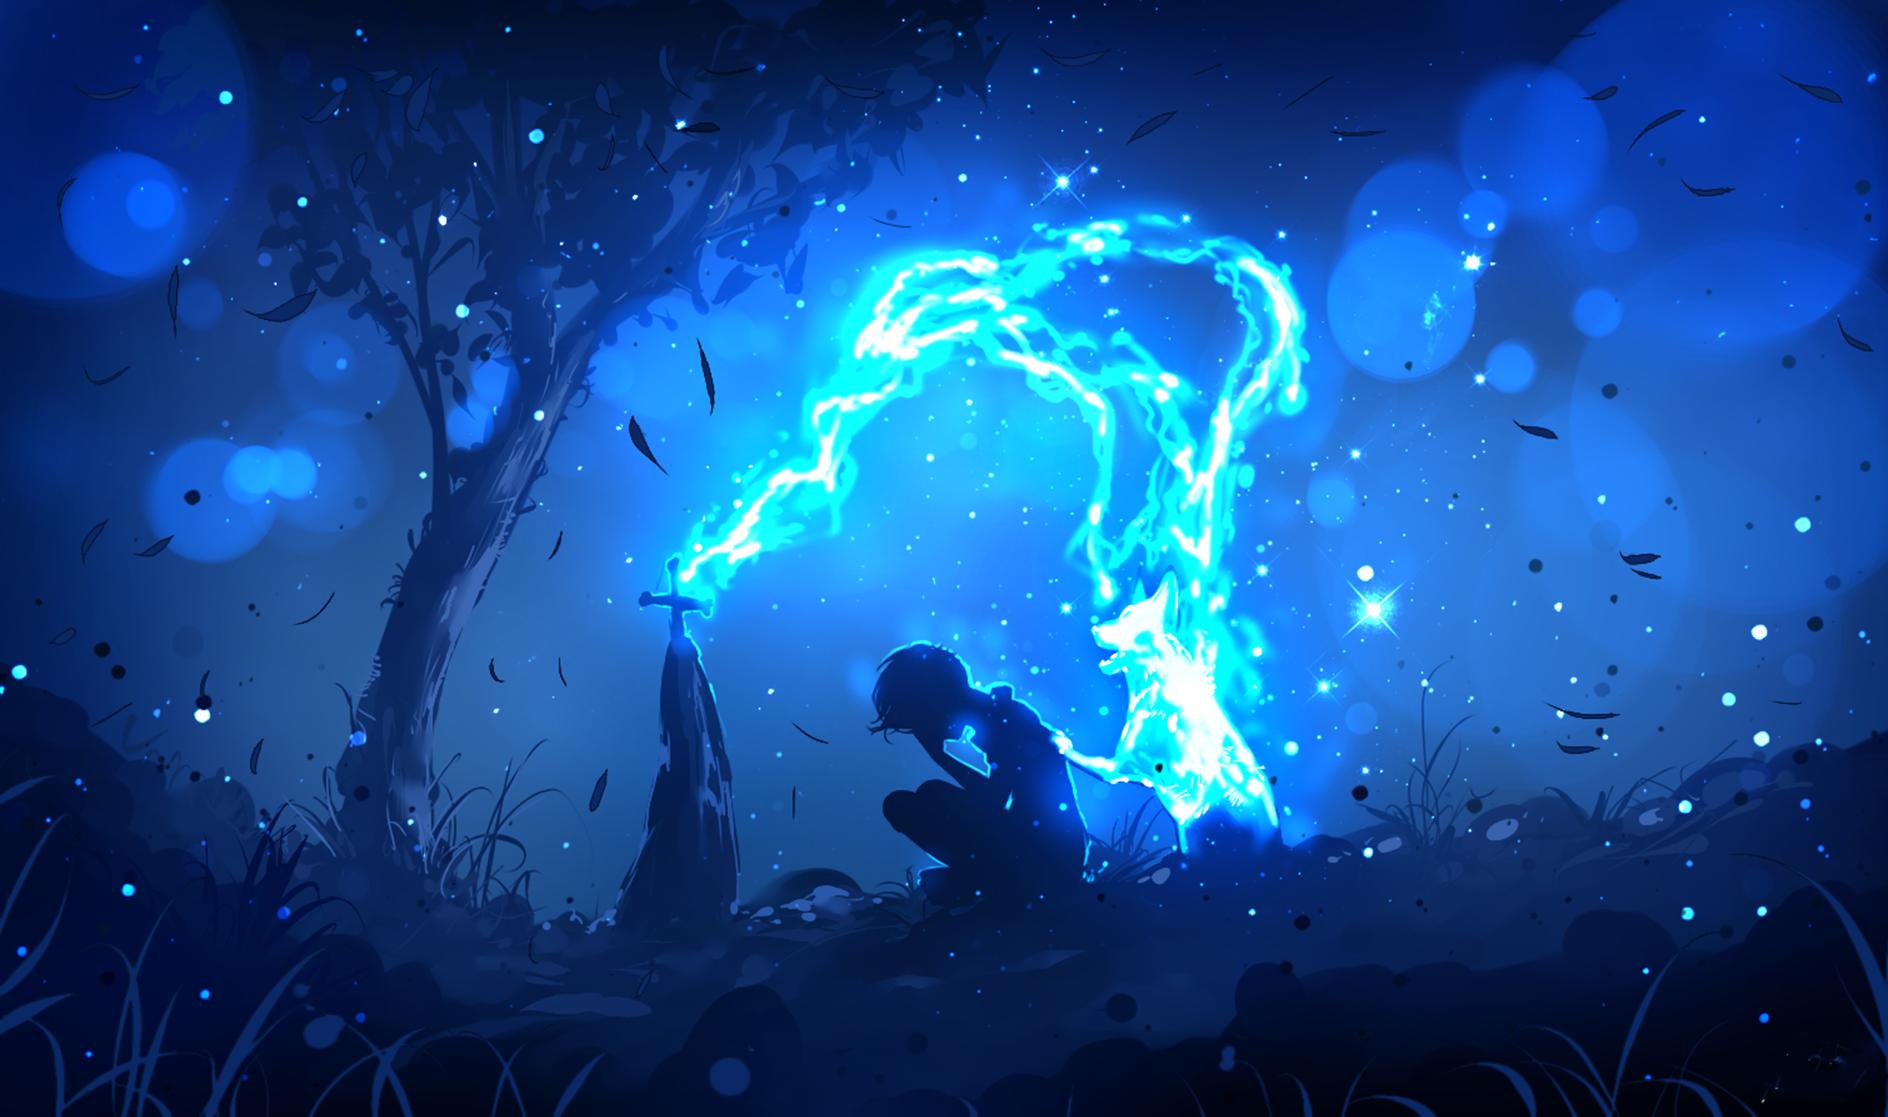 General 1888x1117 digital art artwork dog Spirit fantasy art sadness grave death ryky cyan blue